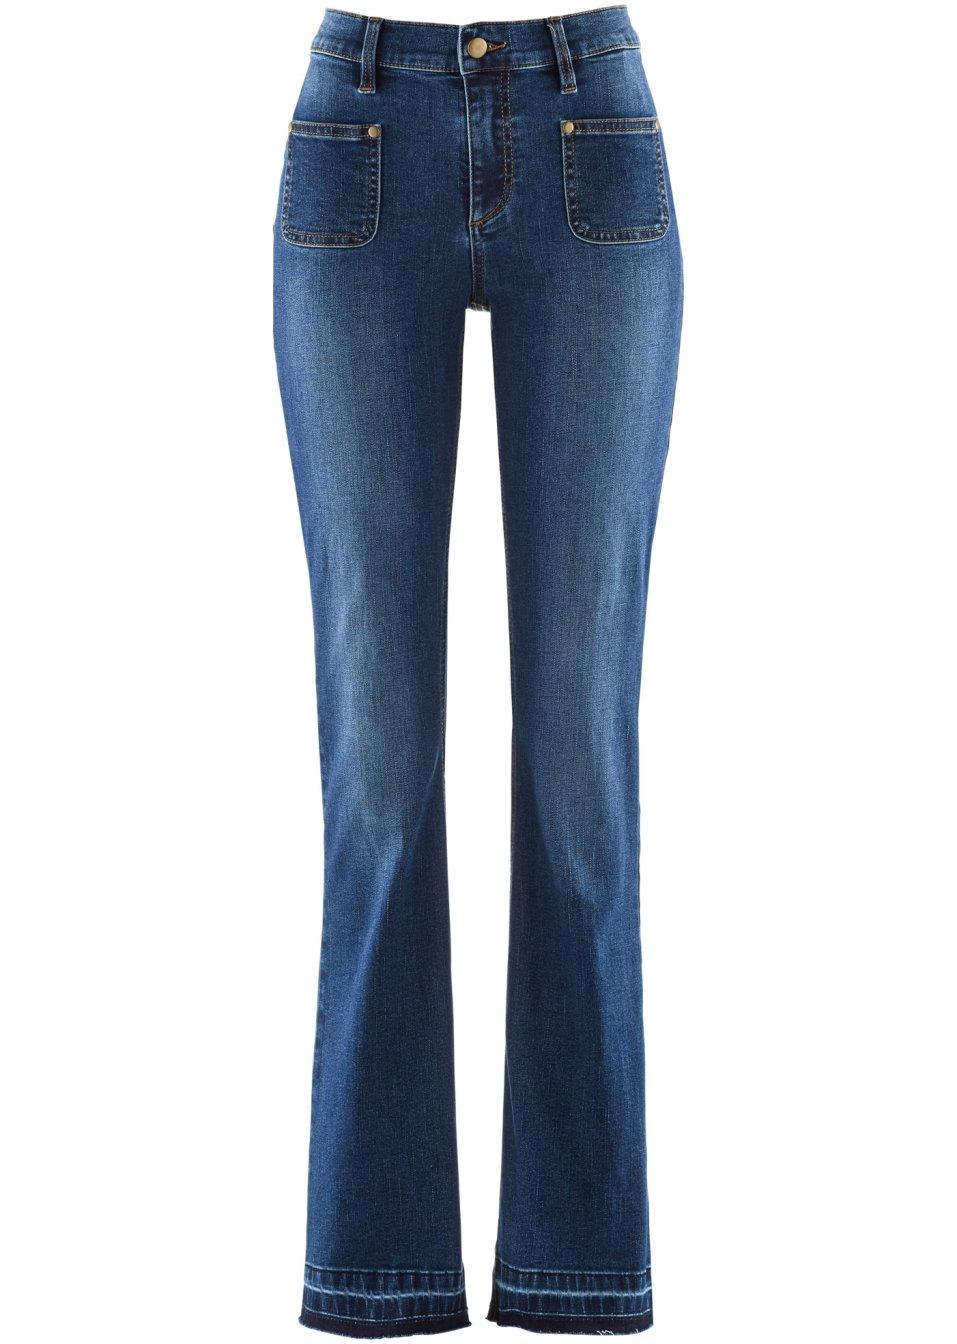 angesagte bootcut jeans mit push up effekt und offenem. Black Bedroom Furniture Sets. Home Design Ideas